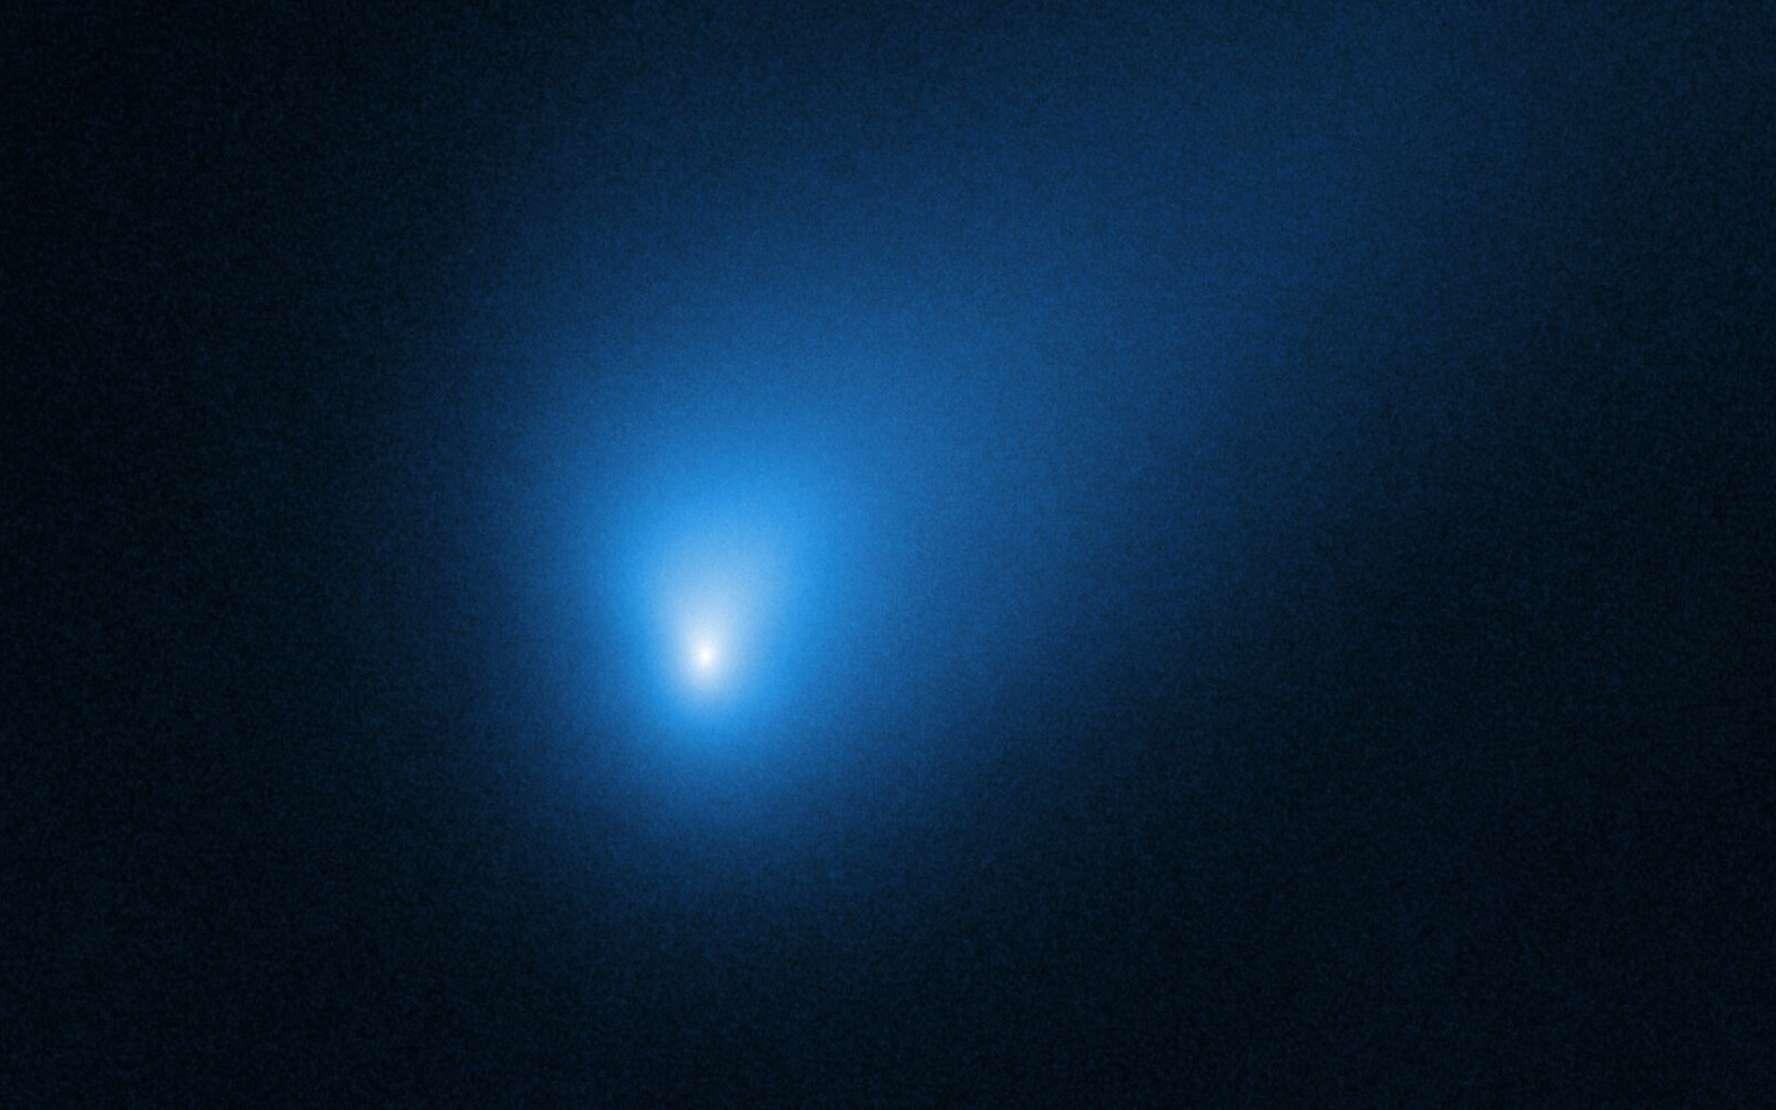 5f5733390a_50155956_comete-borisov-hubble-nasa-esa-d-jewitt-ucla.jpg